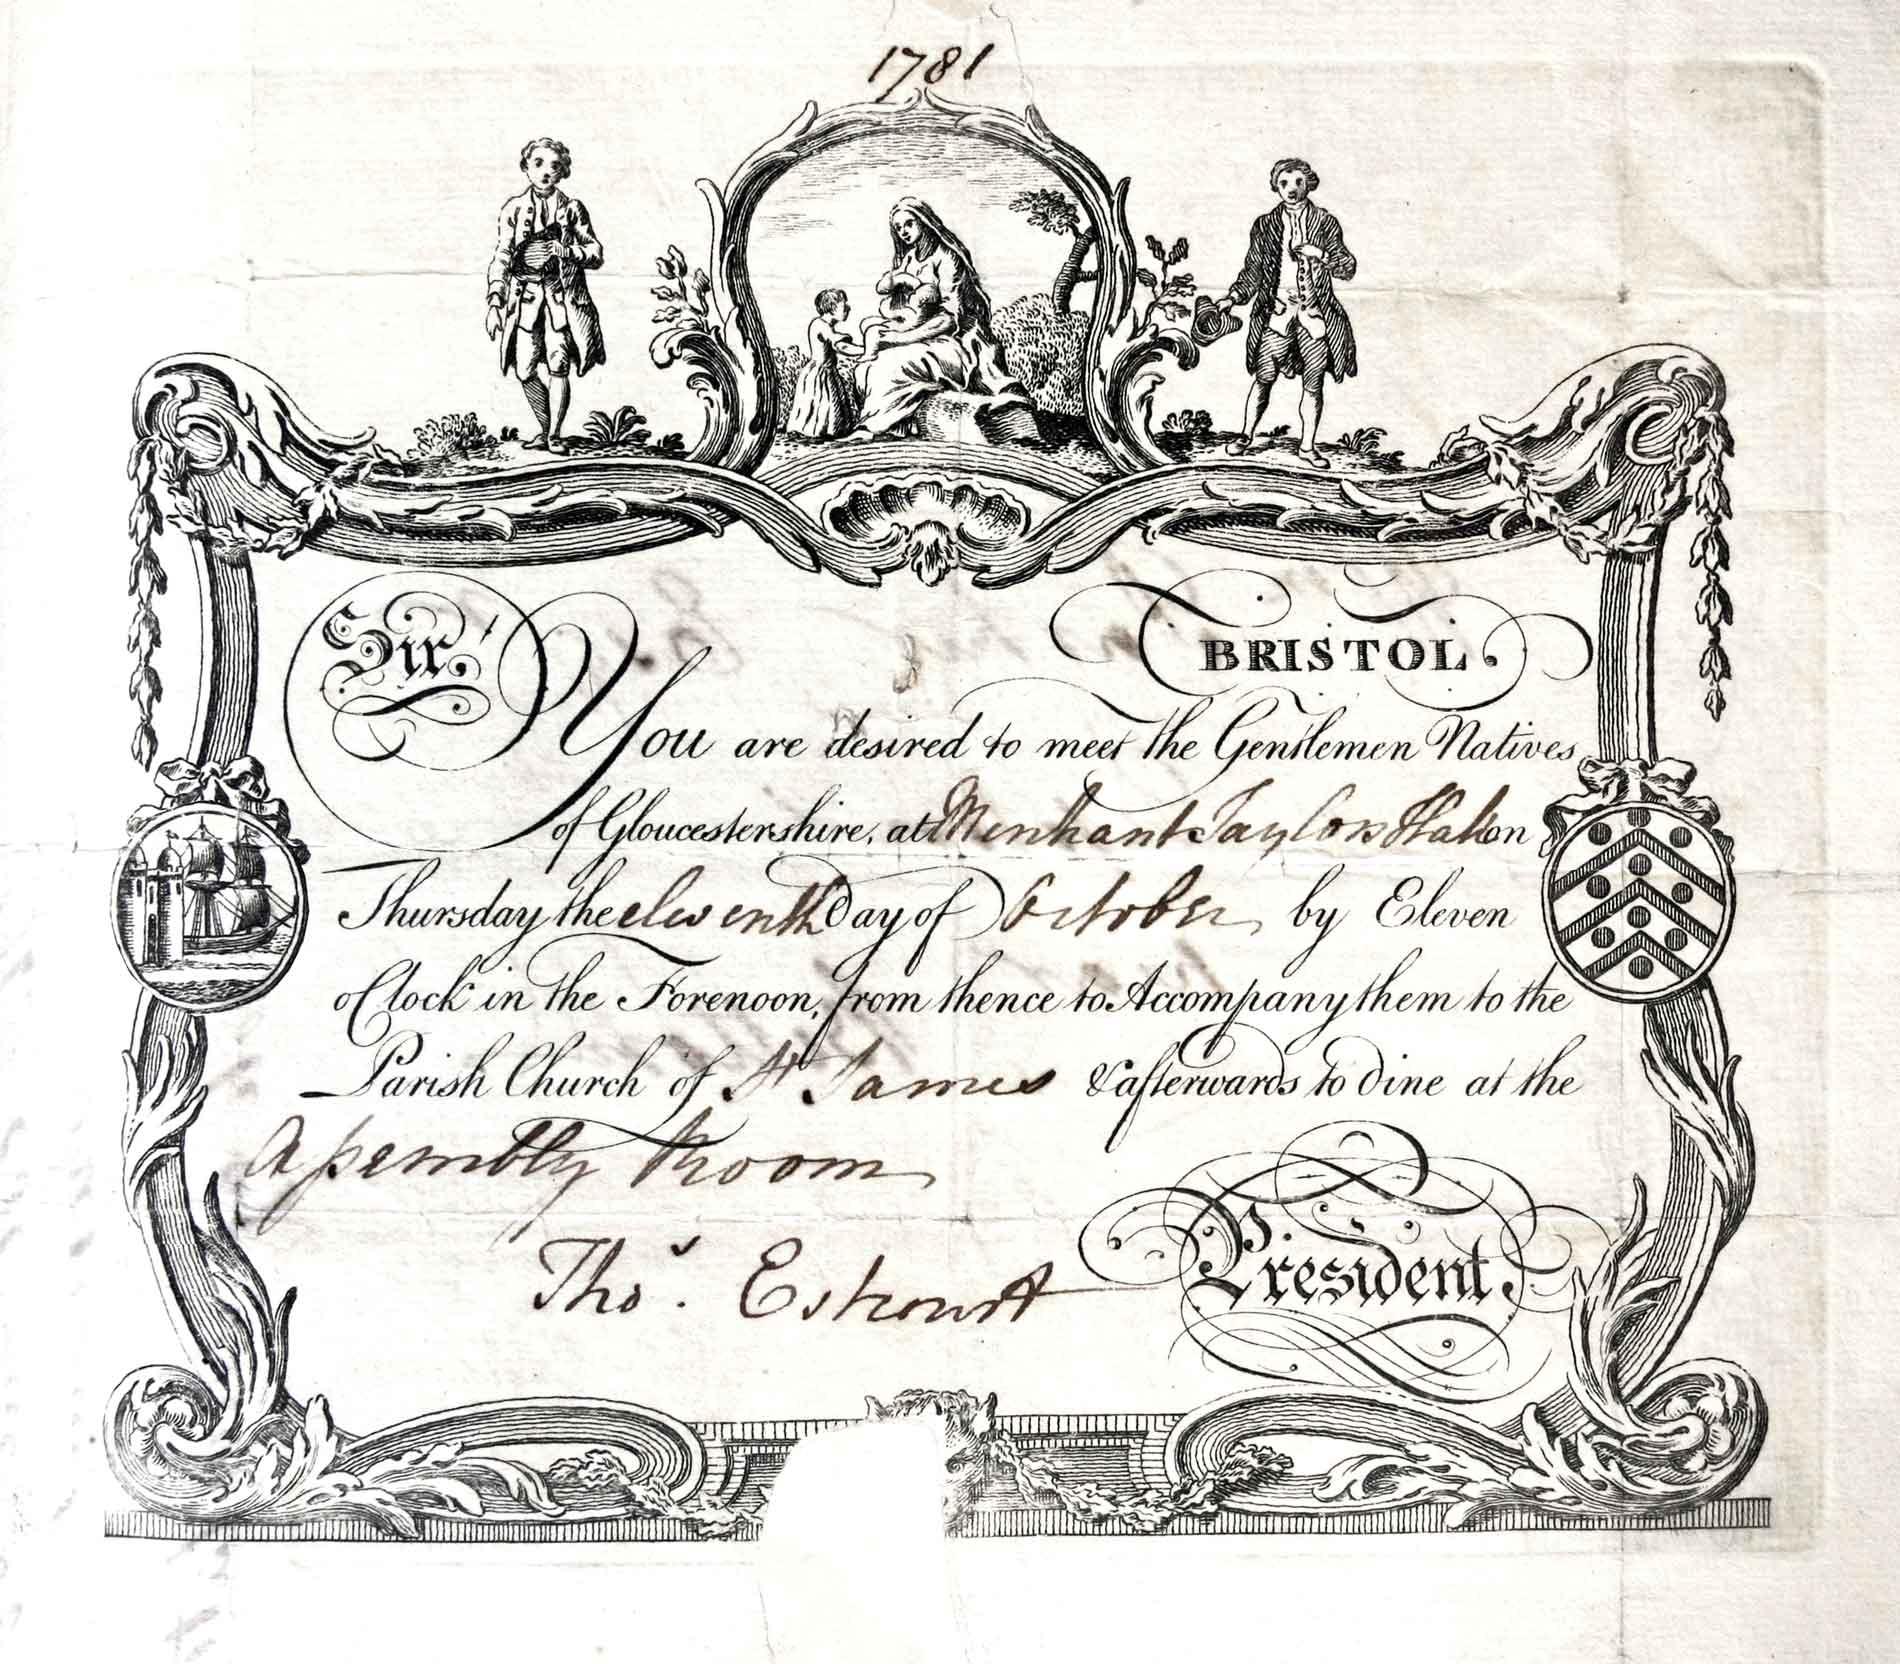 A Gloucestershire Society Invitation From Thomas Estcourt - 1781